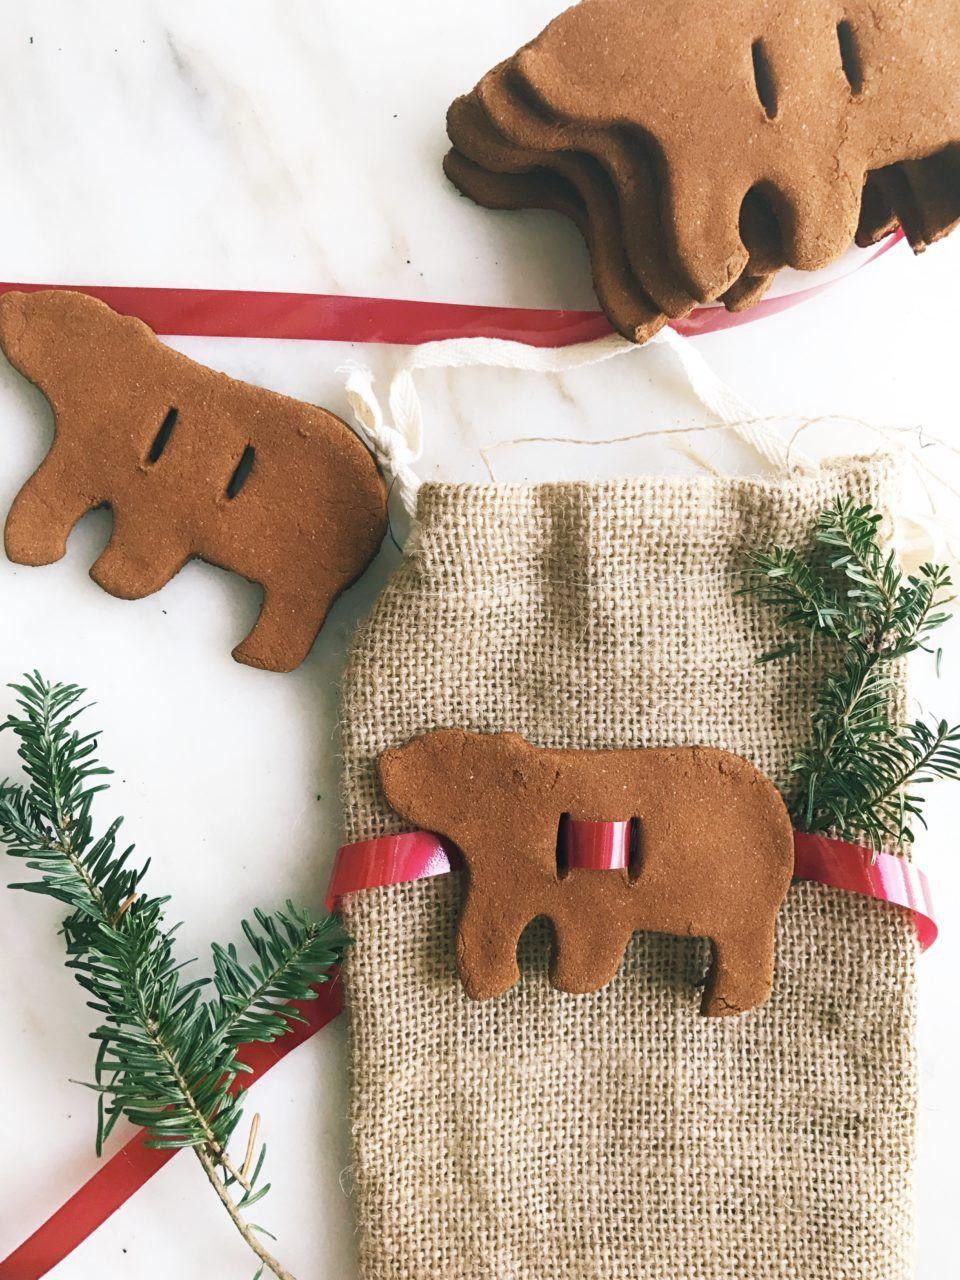 Cinnamon Applesauce Ornaments Diy Christmas Garland Diy Christmas Ornaments Christmas Garland